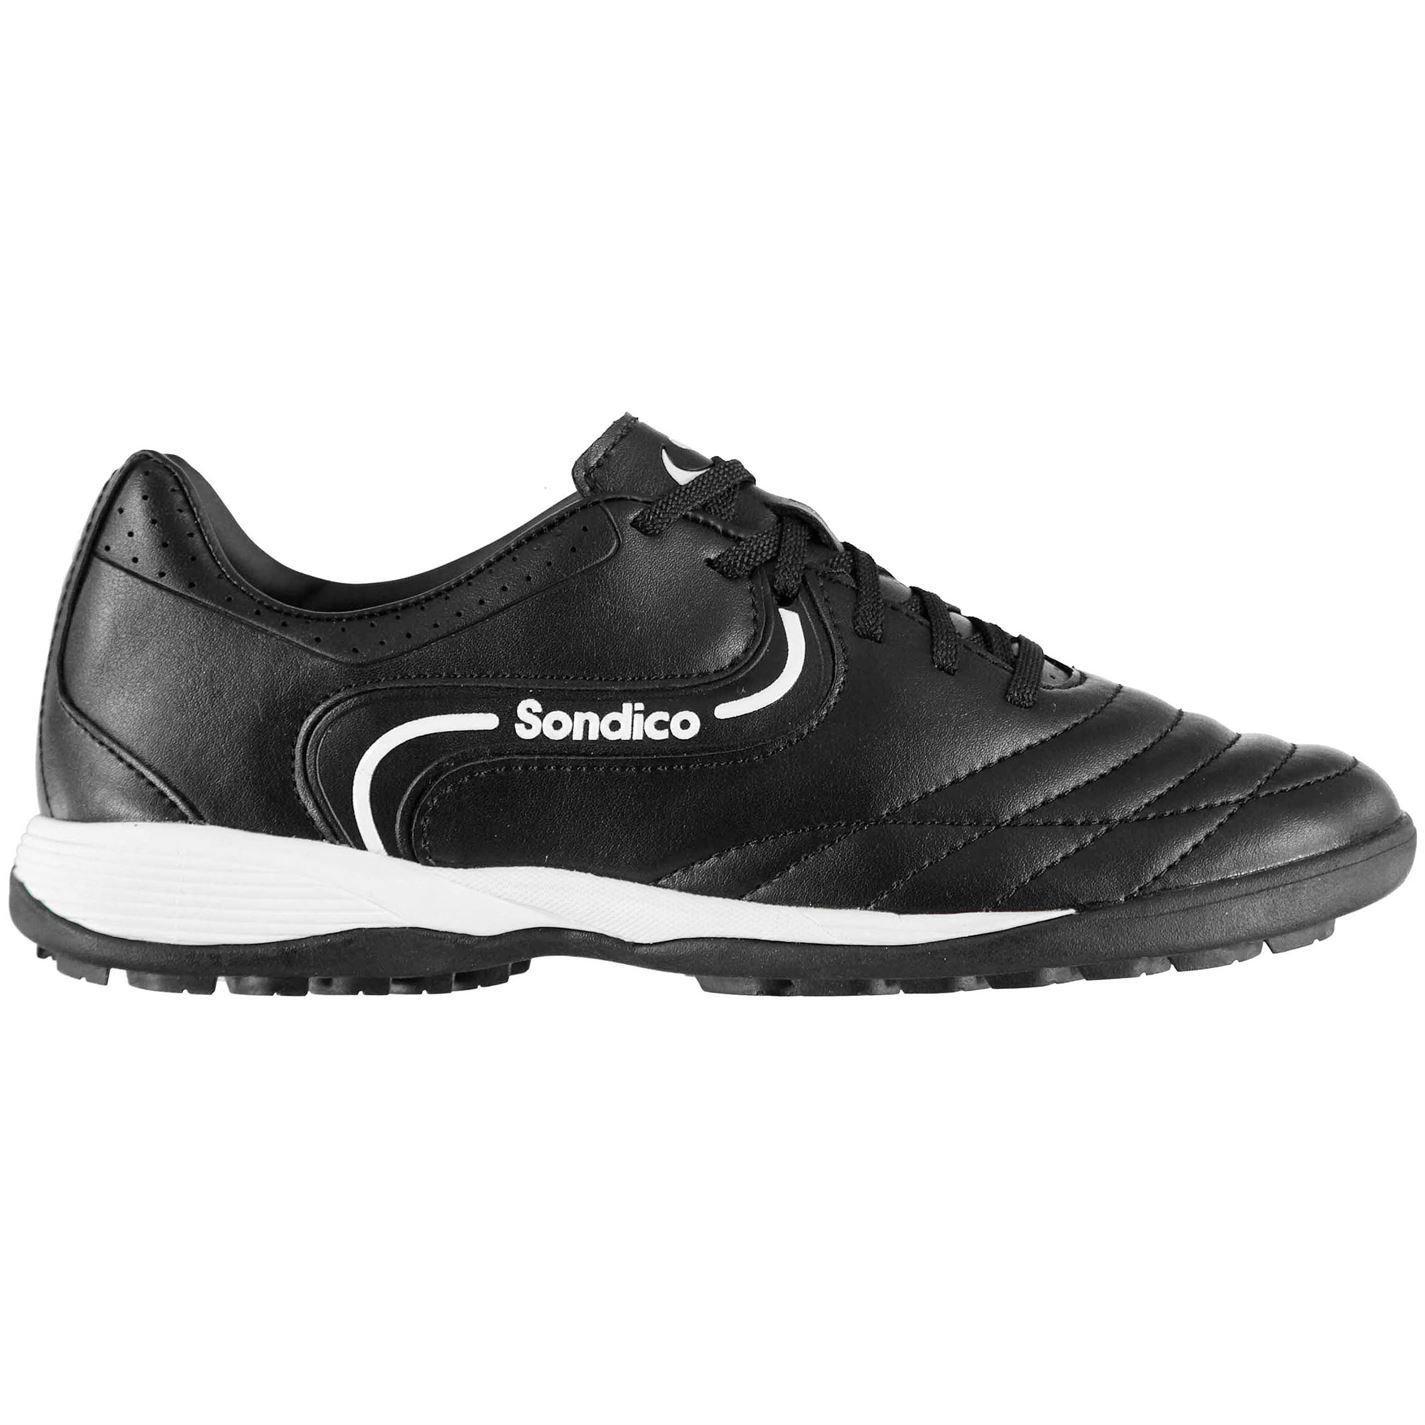 Sondico Kids Strike Ii Tf Football Boots Boys Sports Training Shoes Footwear